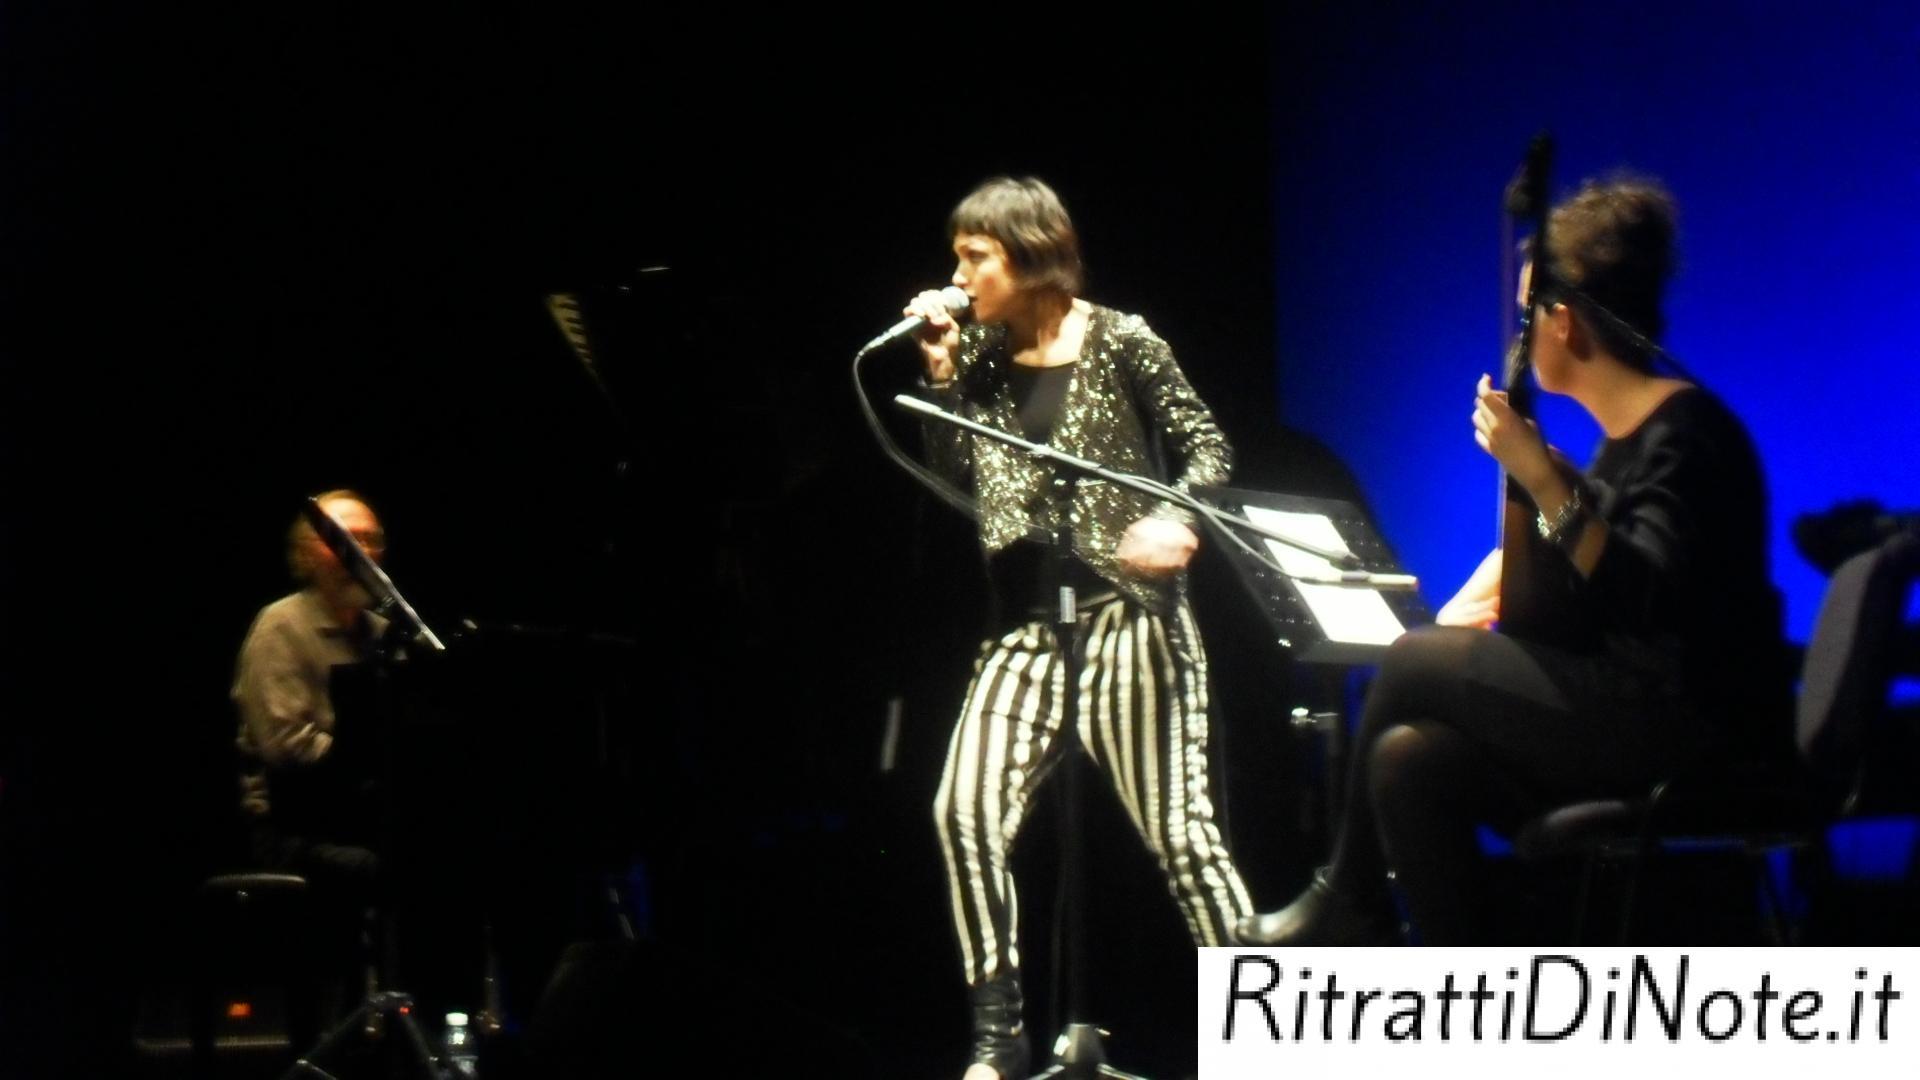 Petra Magoni, Ilaria Fantin, Patrizio Fariselli @ Bambini senza paura - Milano